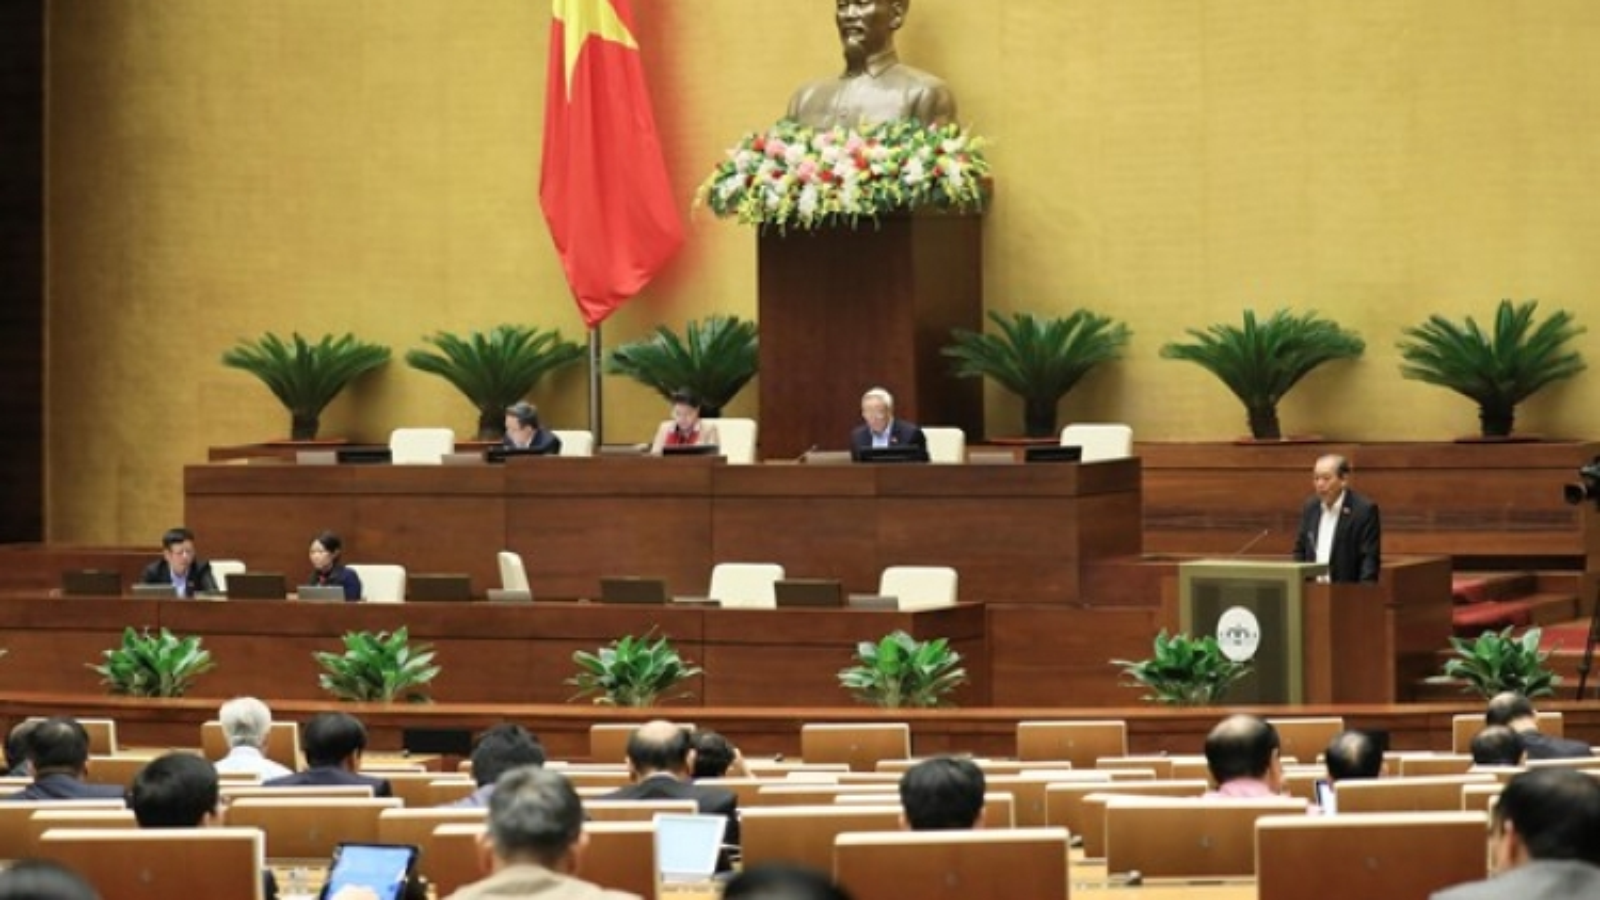 Legislators debate anti-corruption efforts